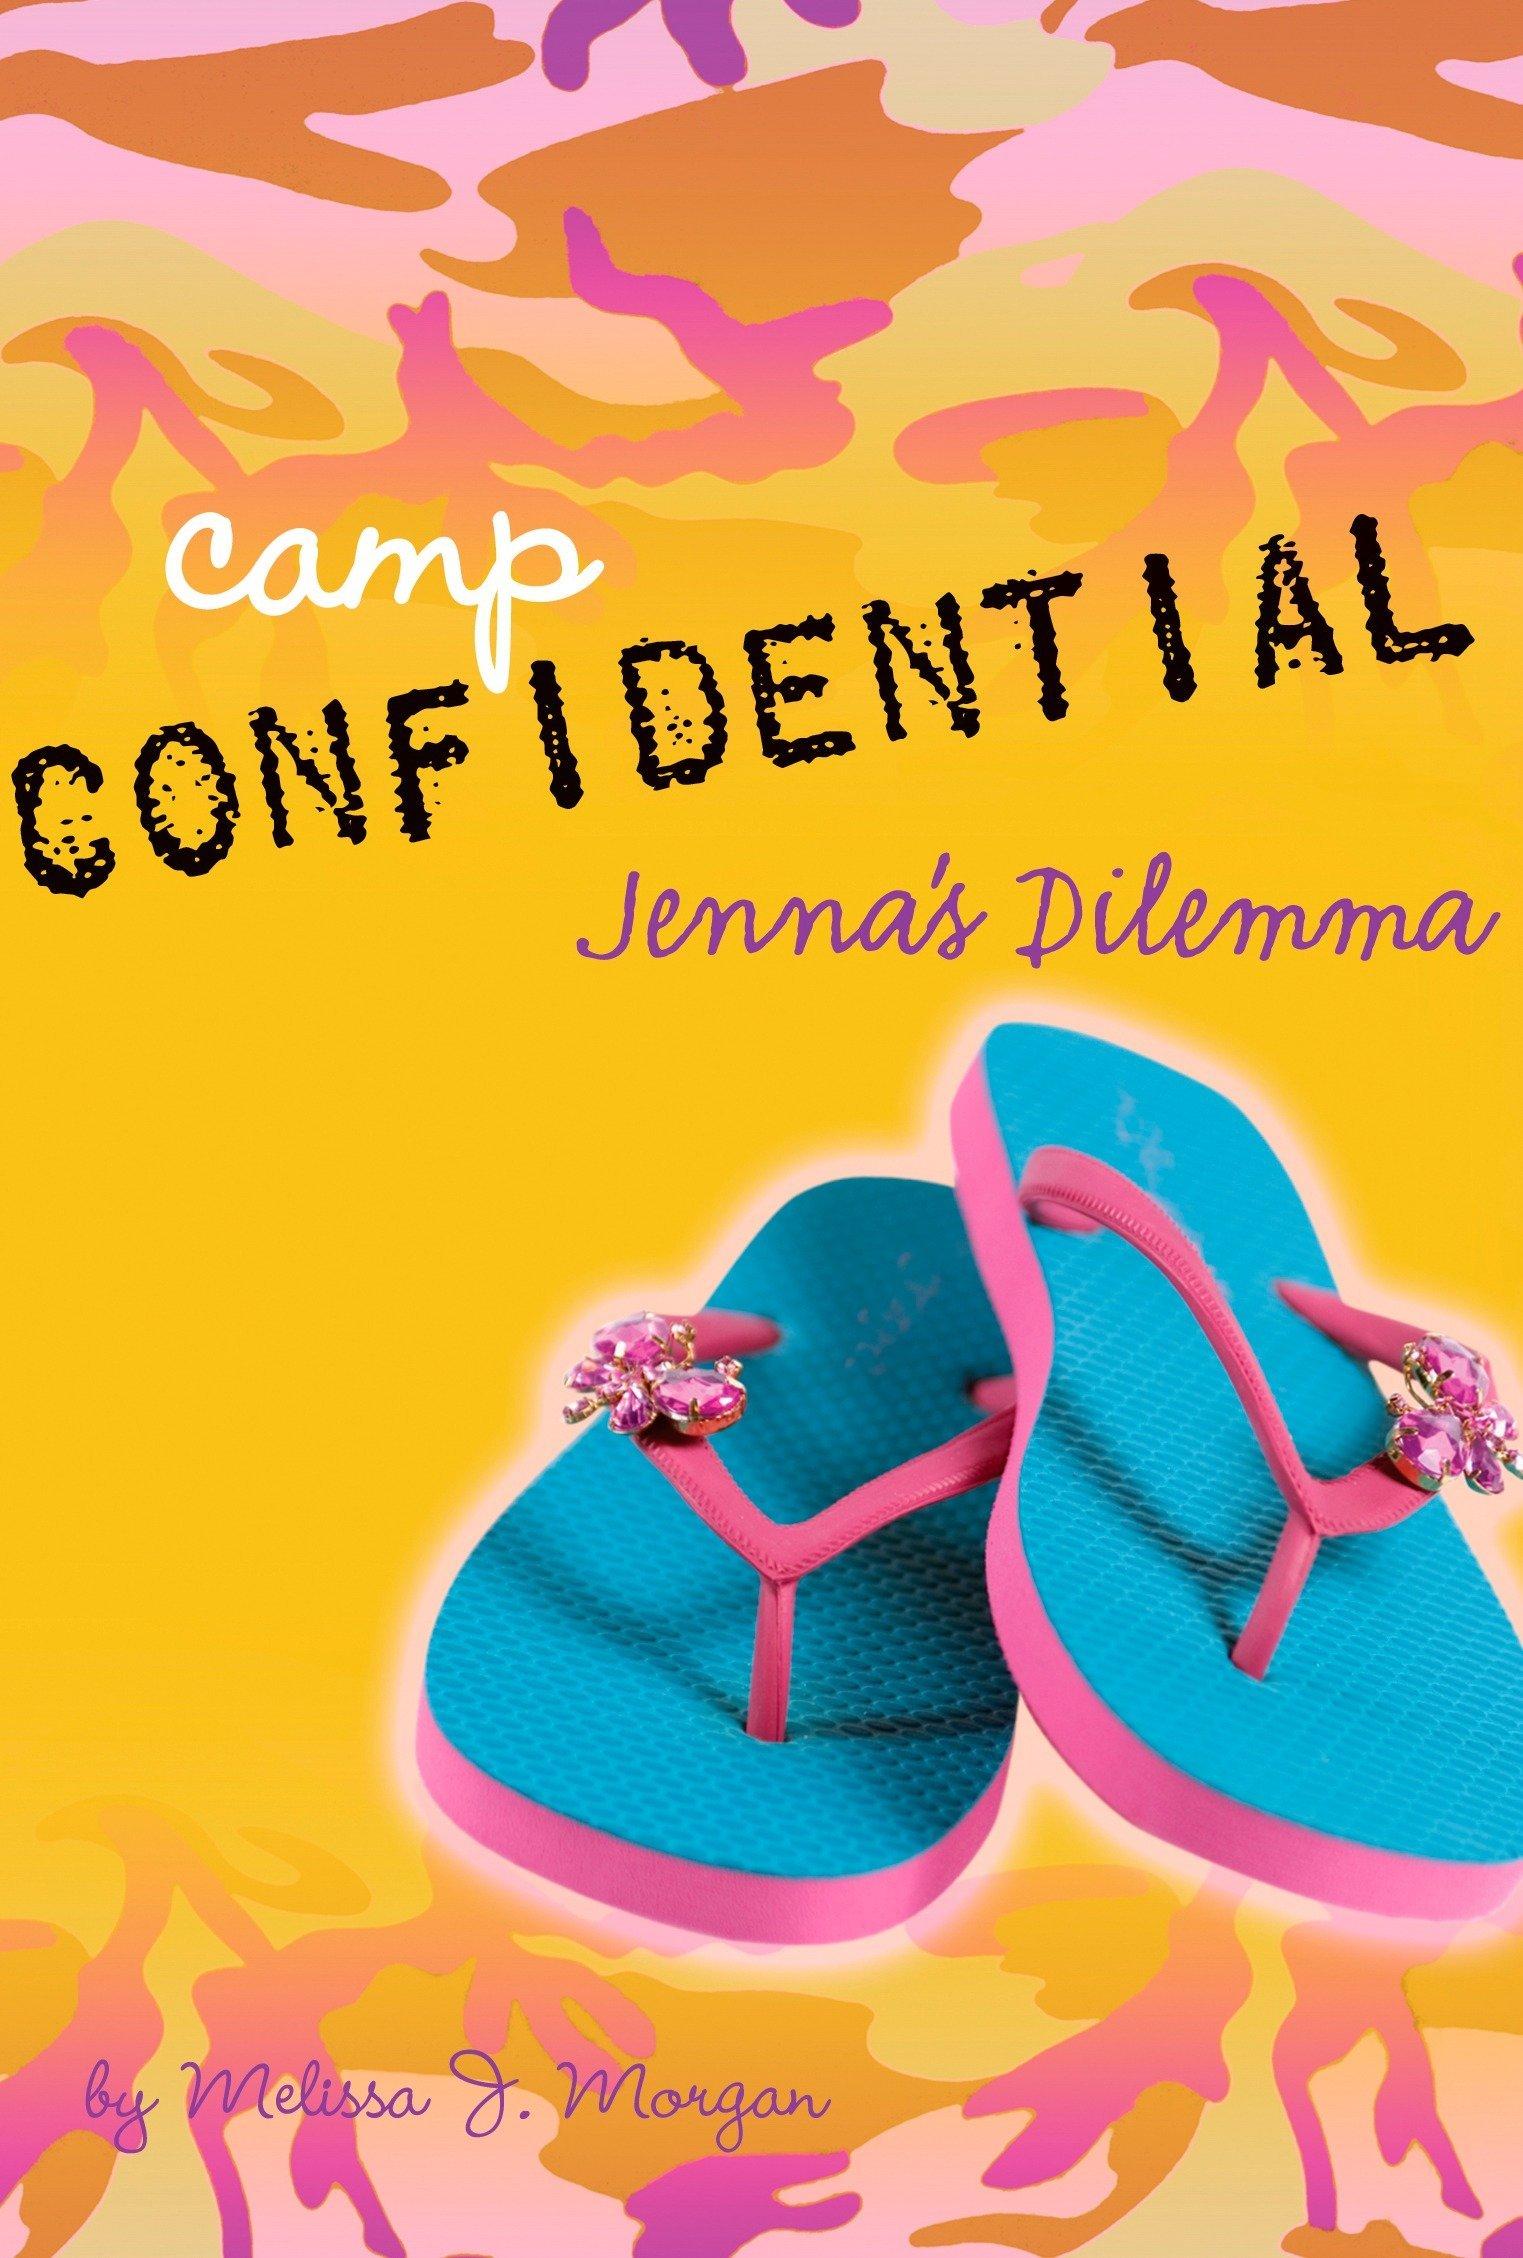 Download Jenna's Dilemma #2 (Camp Confidential) pdf